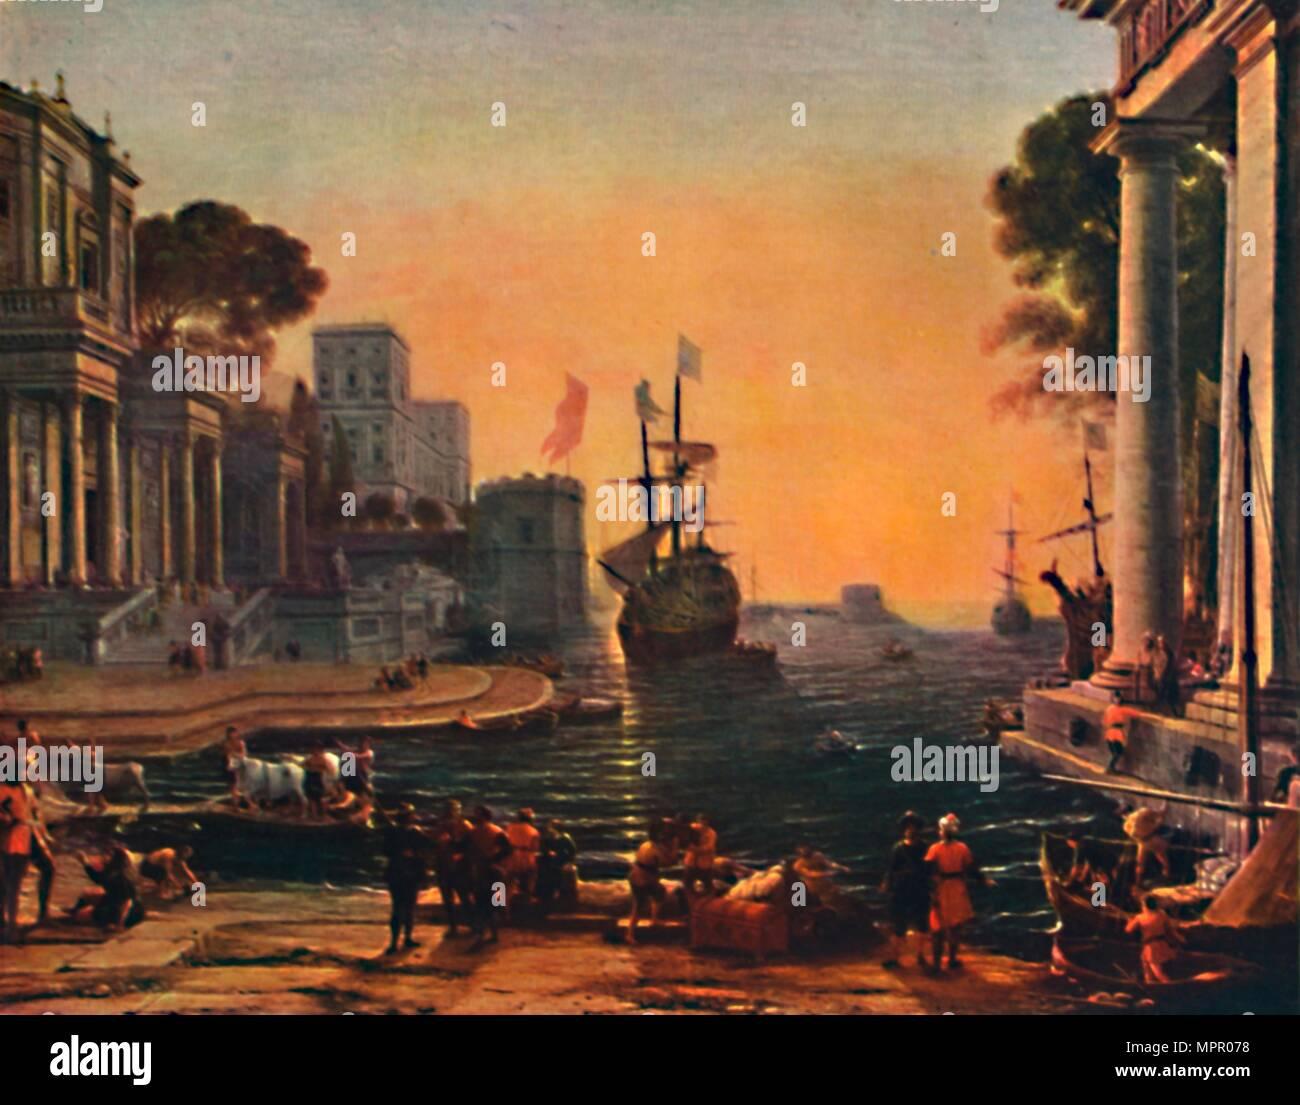 'A Seaport (Vue d'un Port de Mer: Effet de Brume)', 17th century, (1911). Artist: Claude Lorrain. - Stock Image